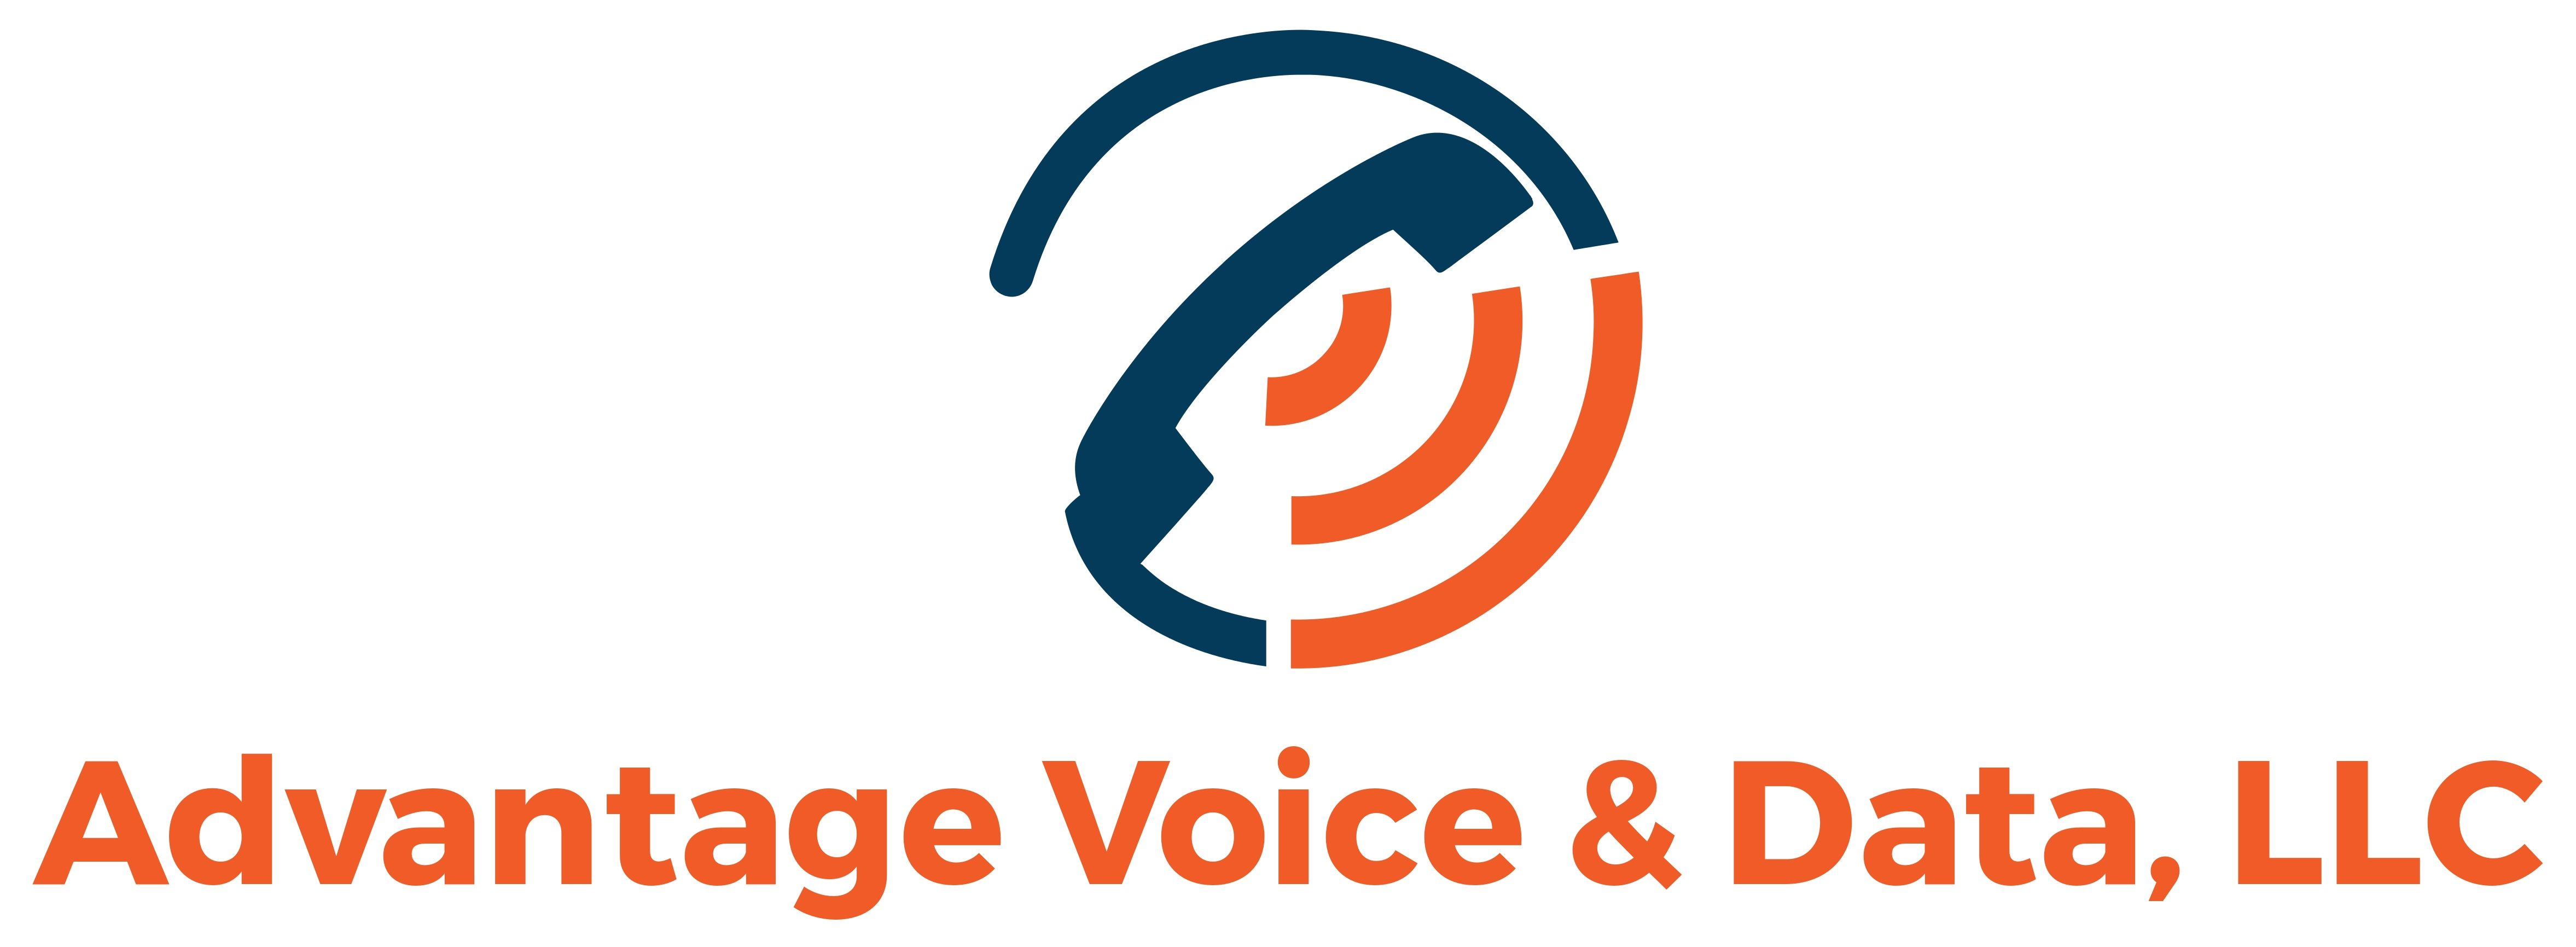 Advantage Voice  Data, LLC